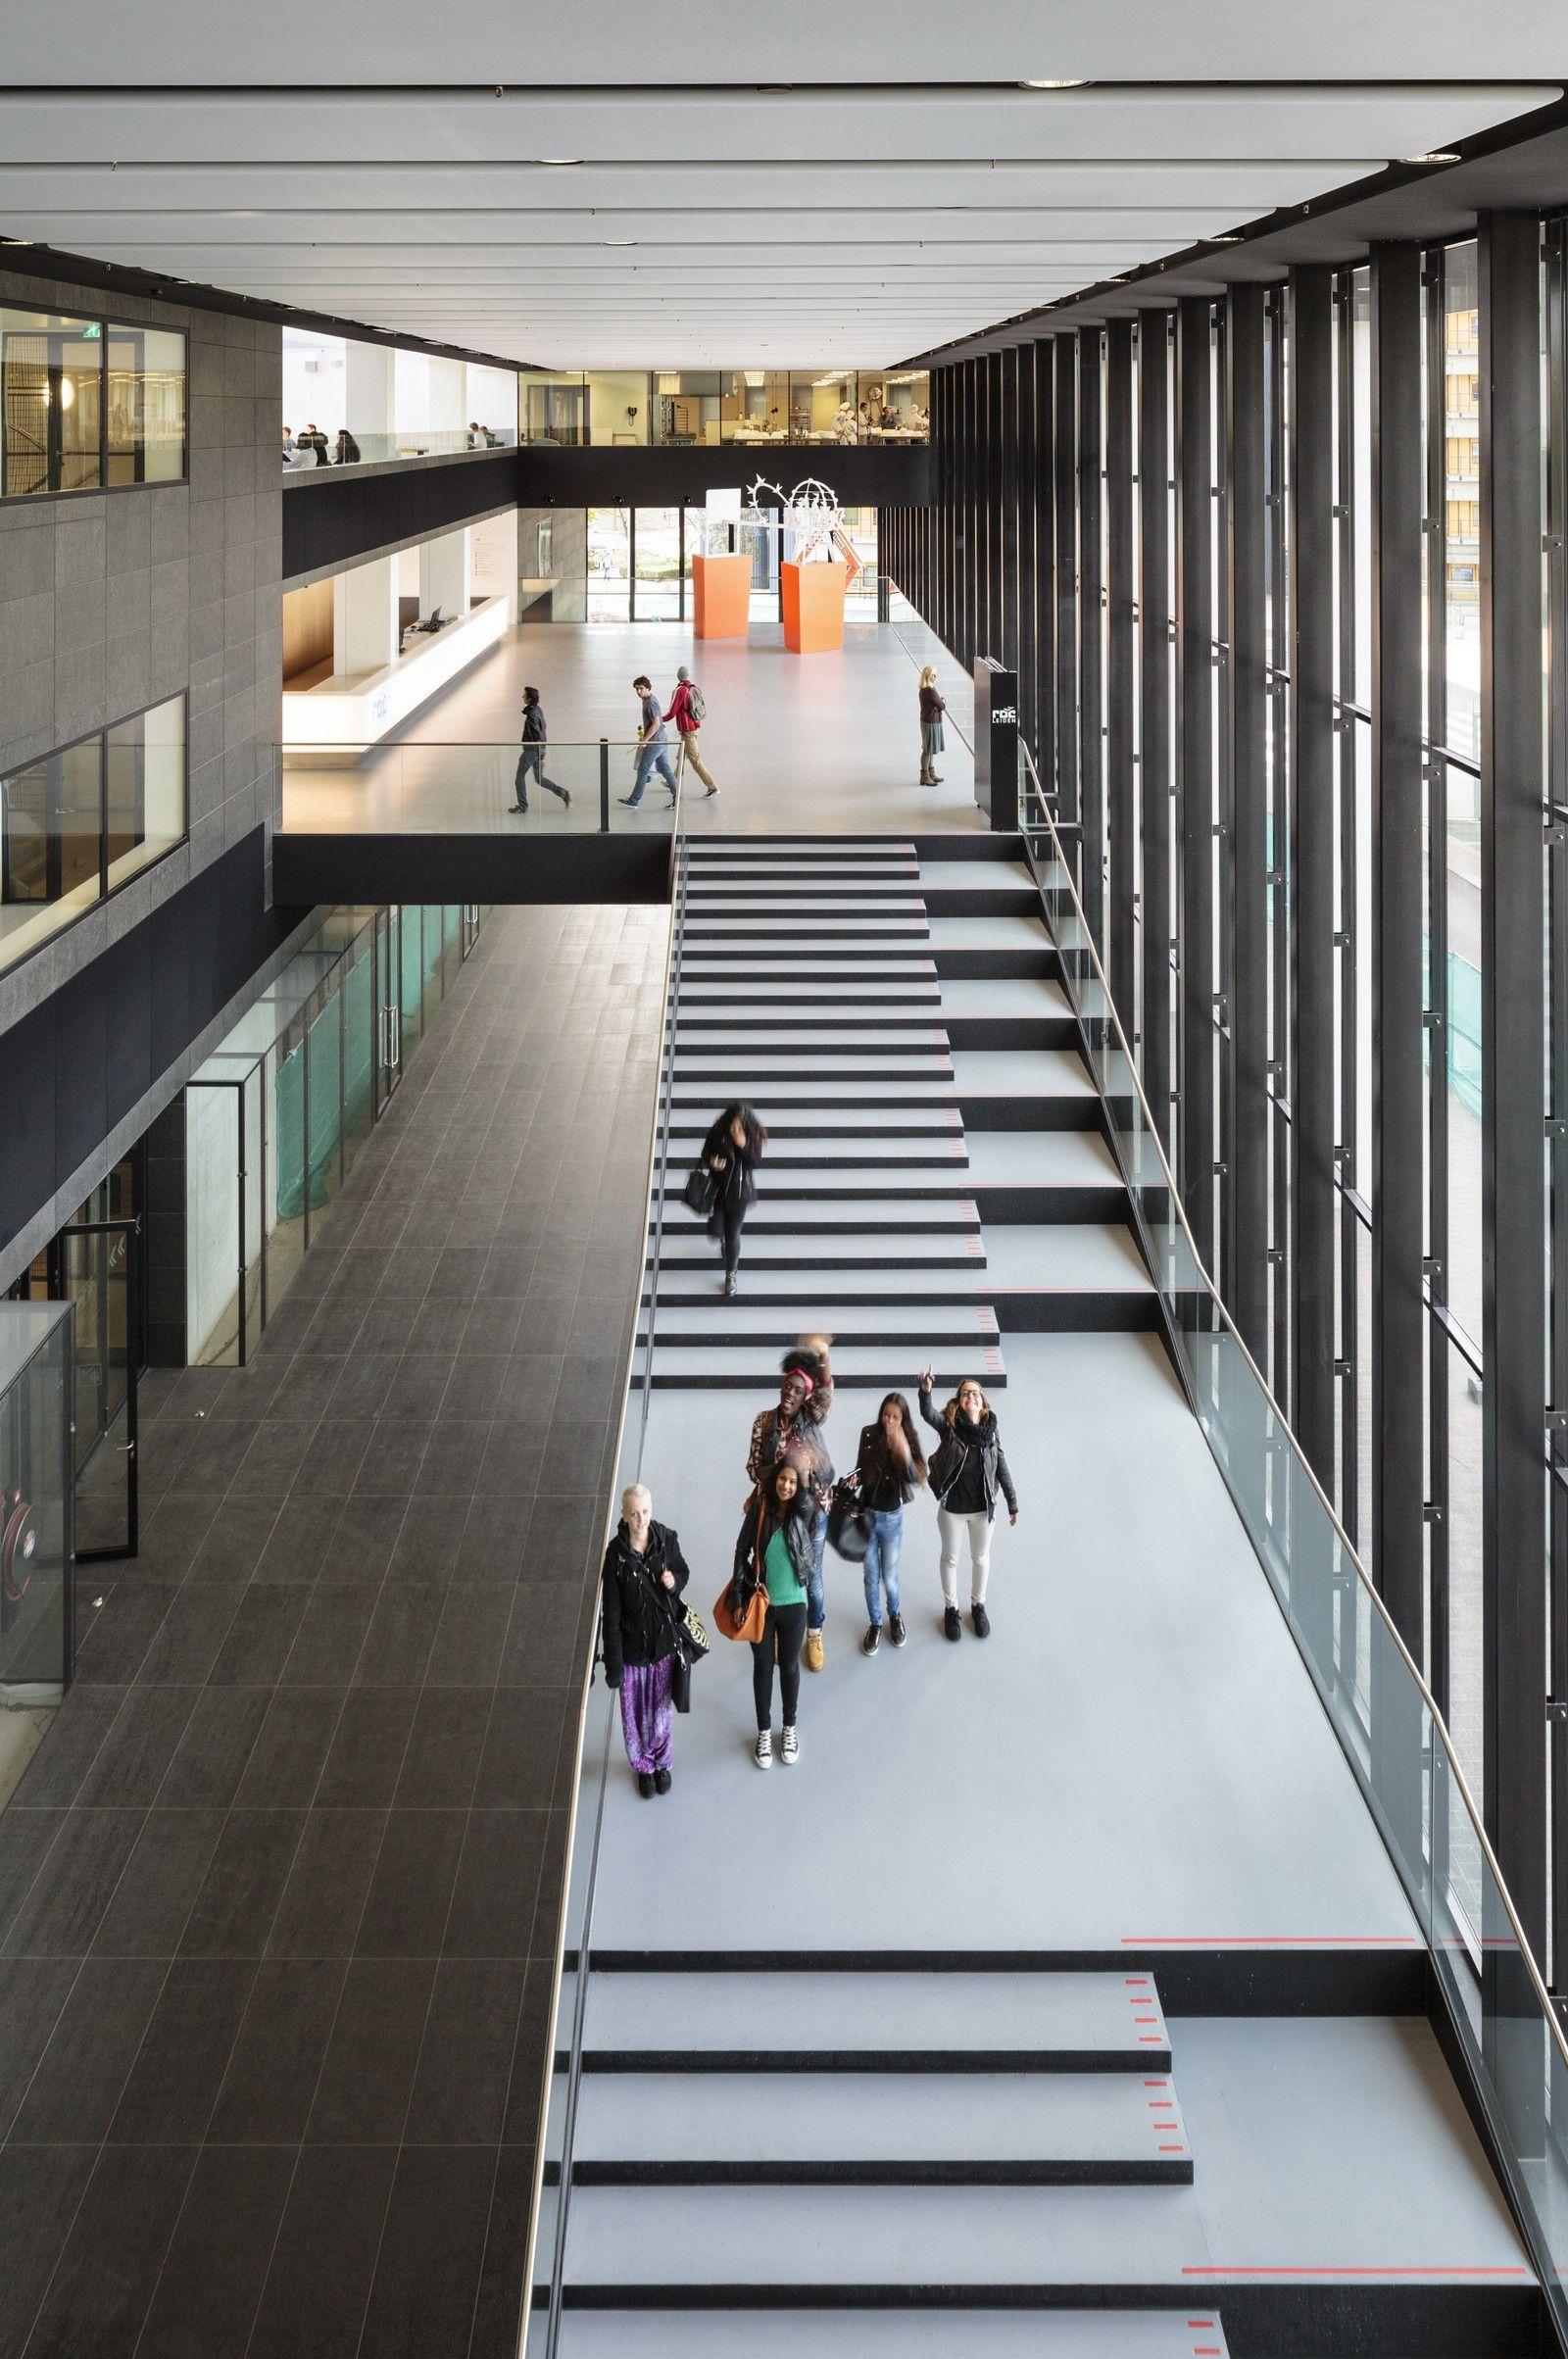 Archello stairs pinterest escalera arquitectura y for Escaleras arquitectura